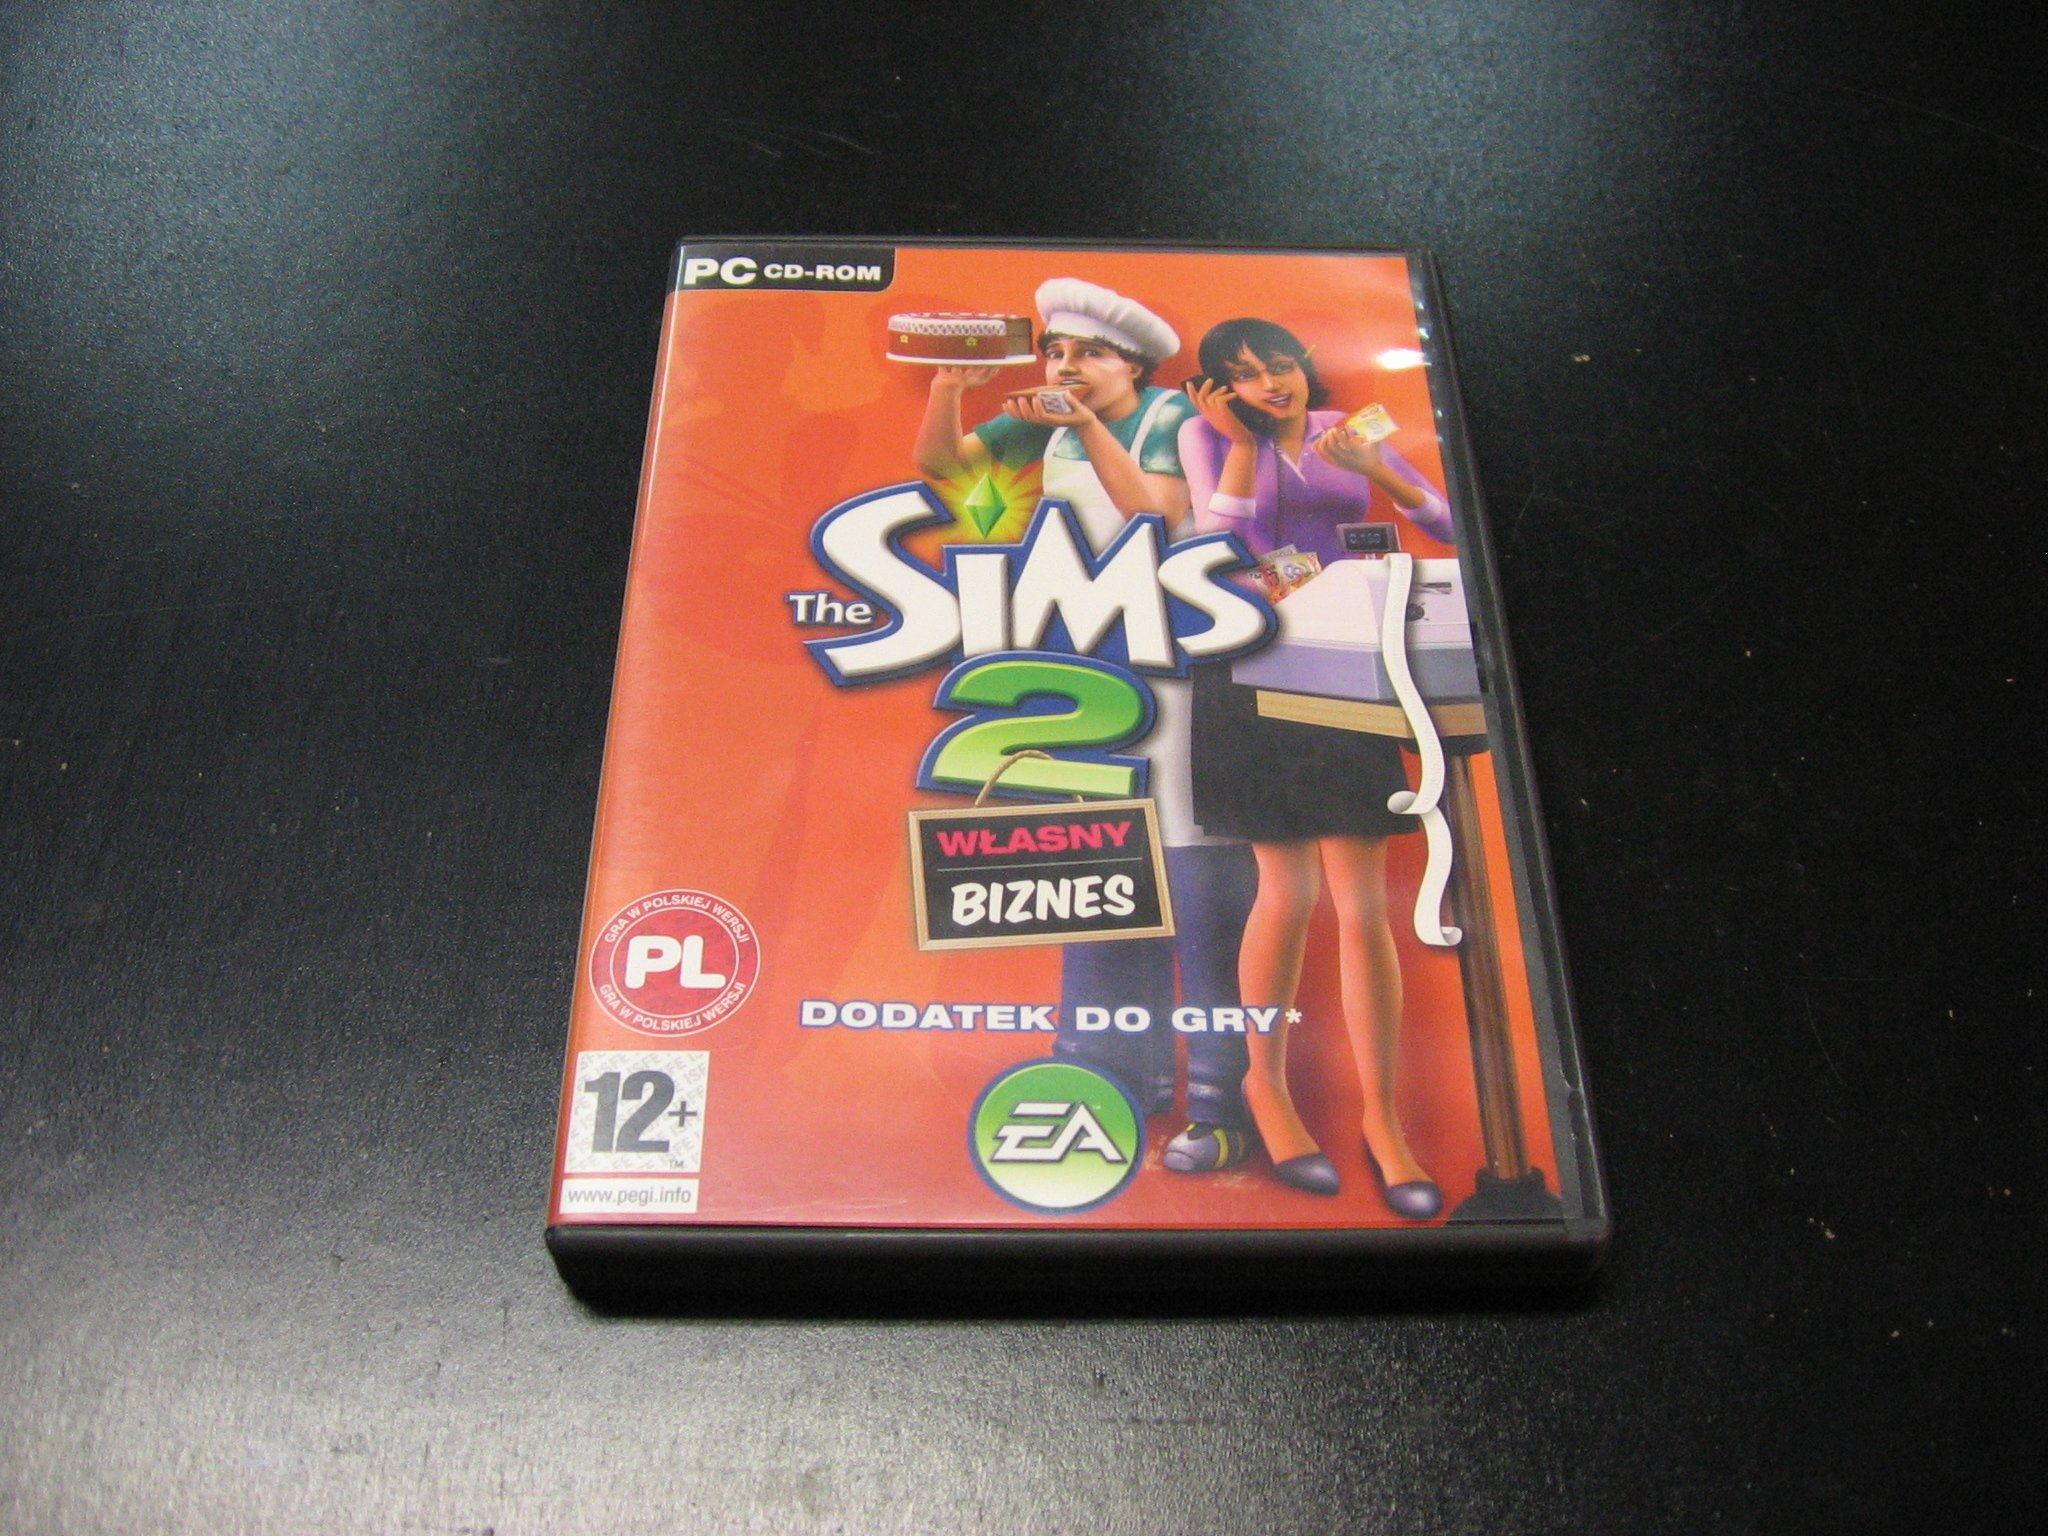 The Sims 2 Własny biznes PL - GRA PC Opole 0119